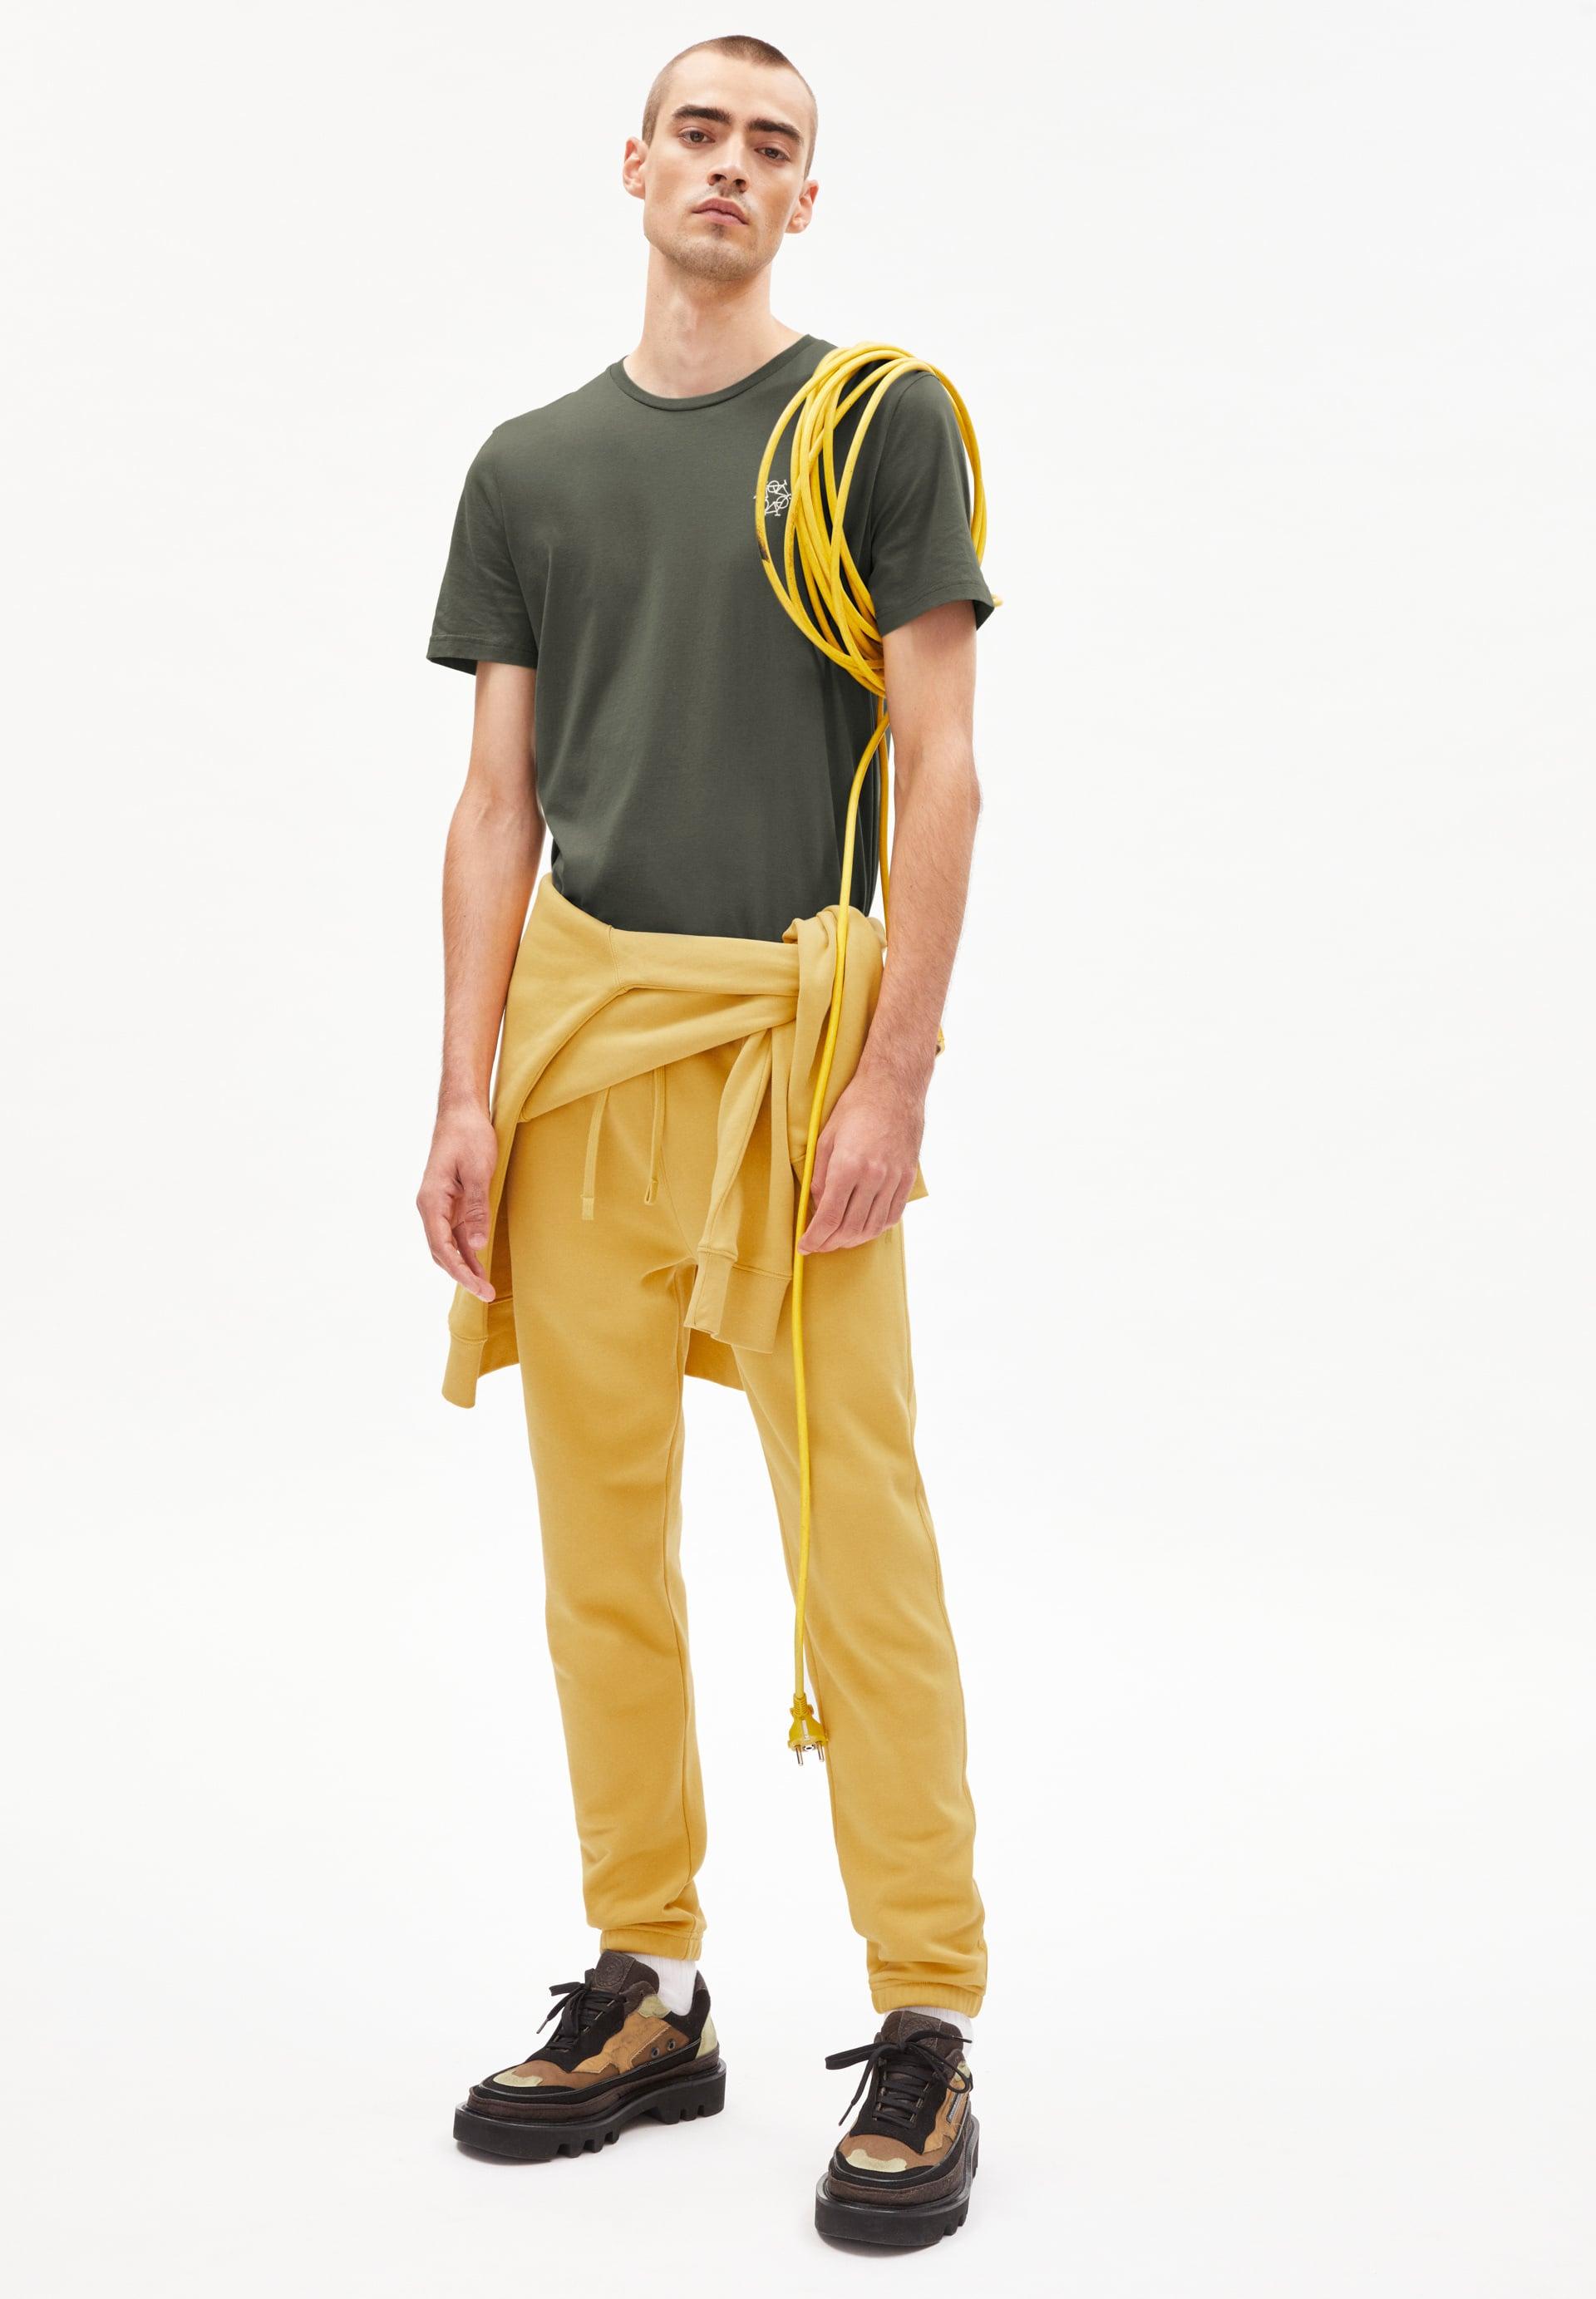 AADAN COMFORT Pantalon de survêtement en coton bio